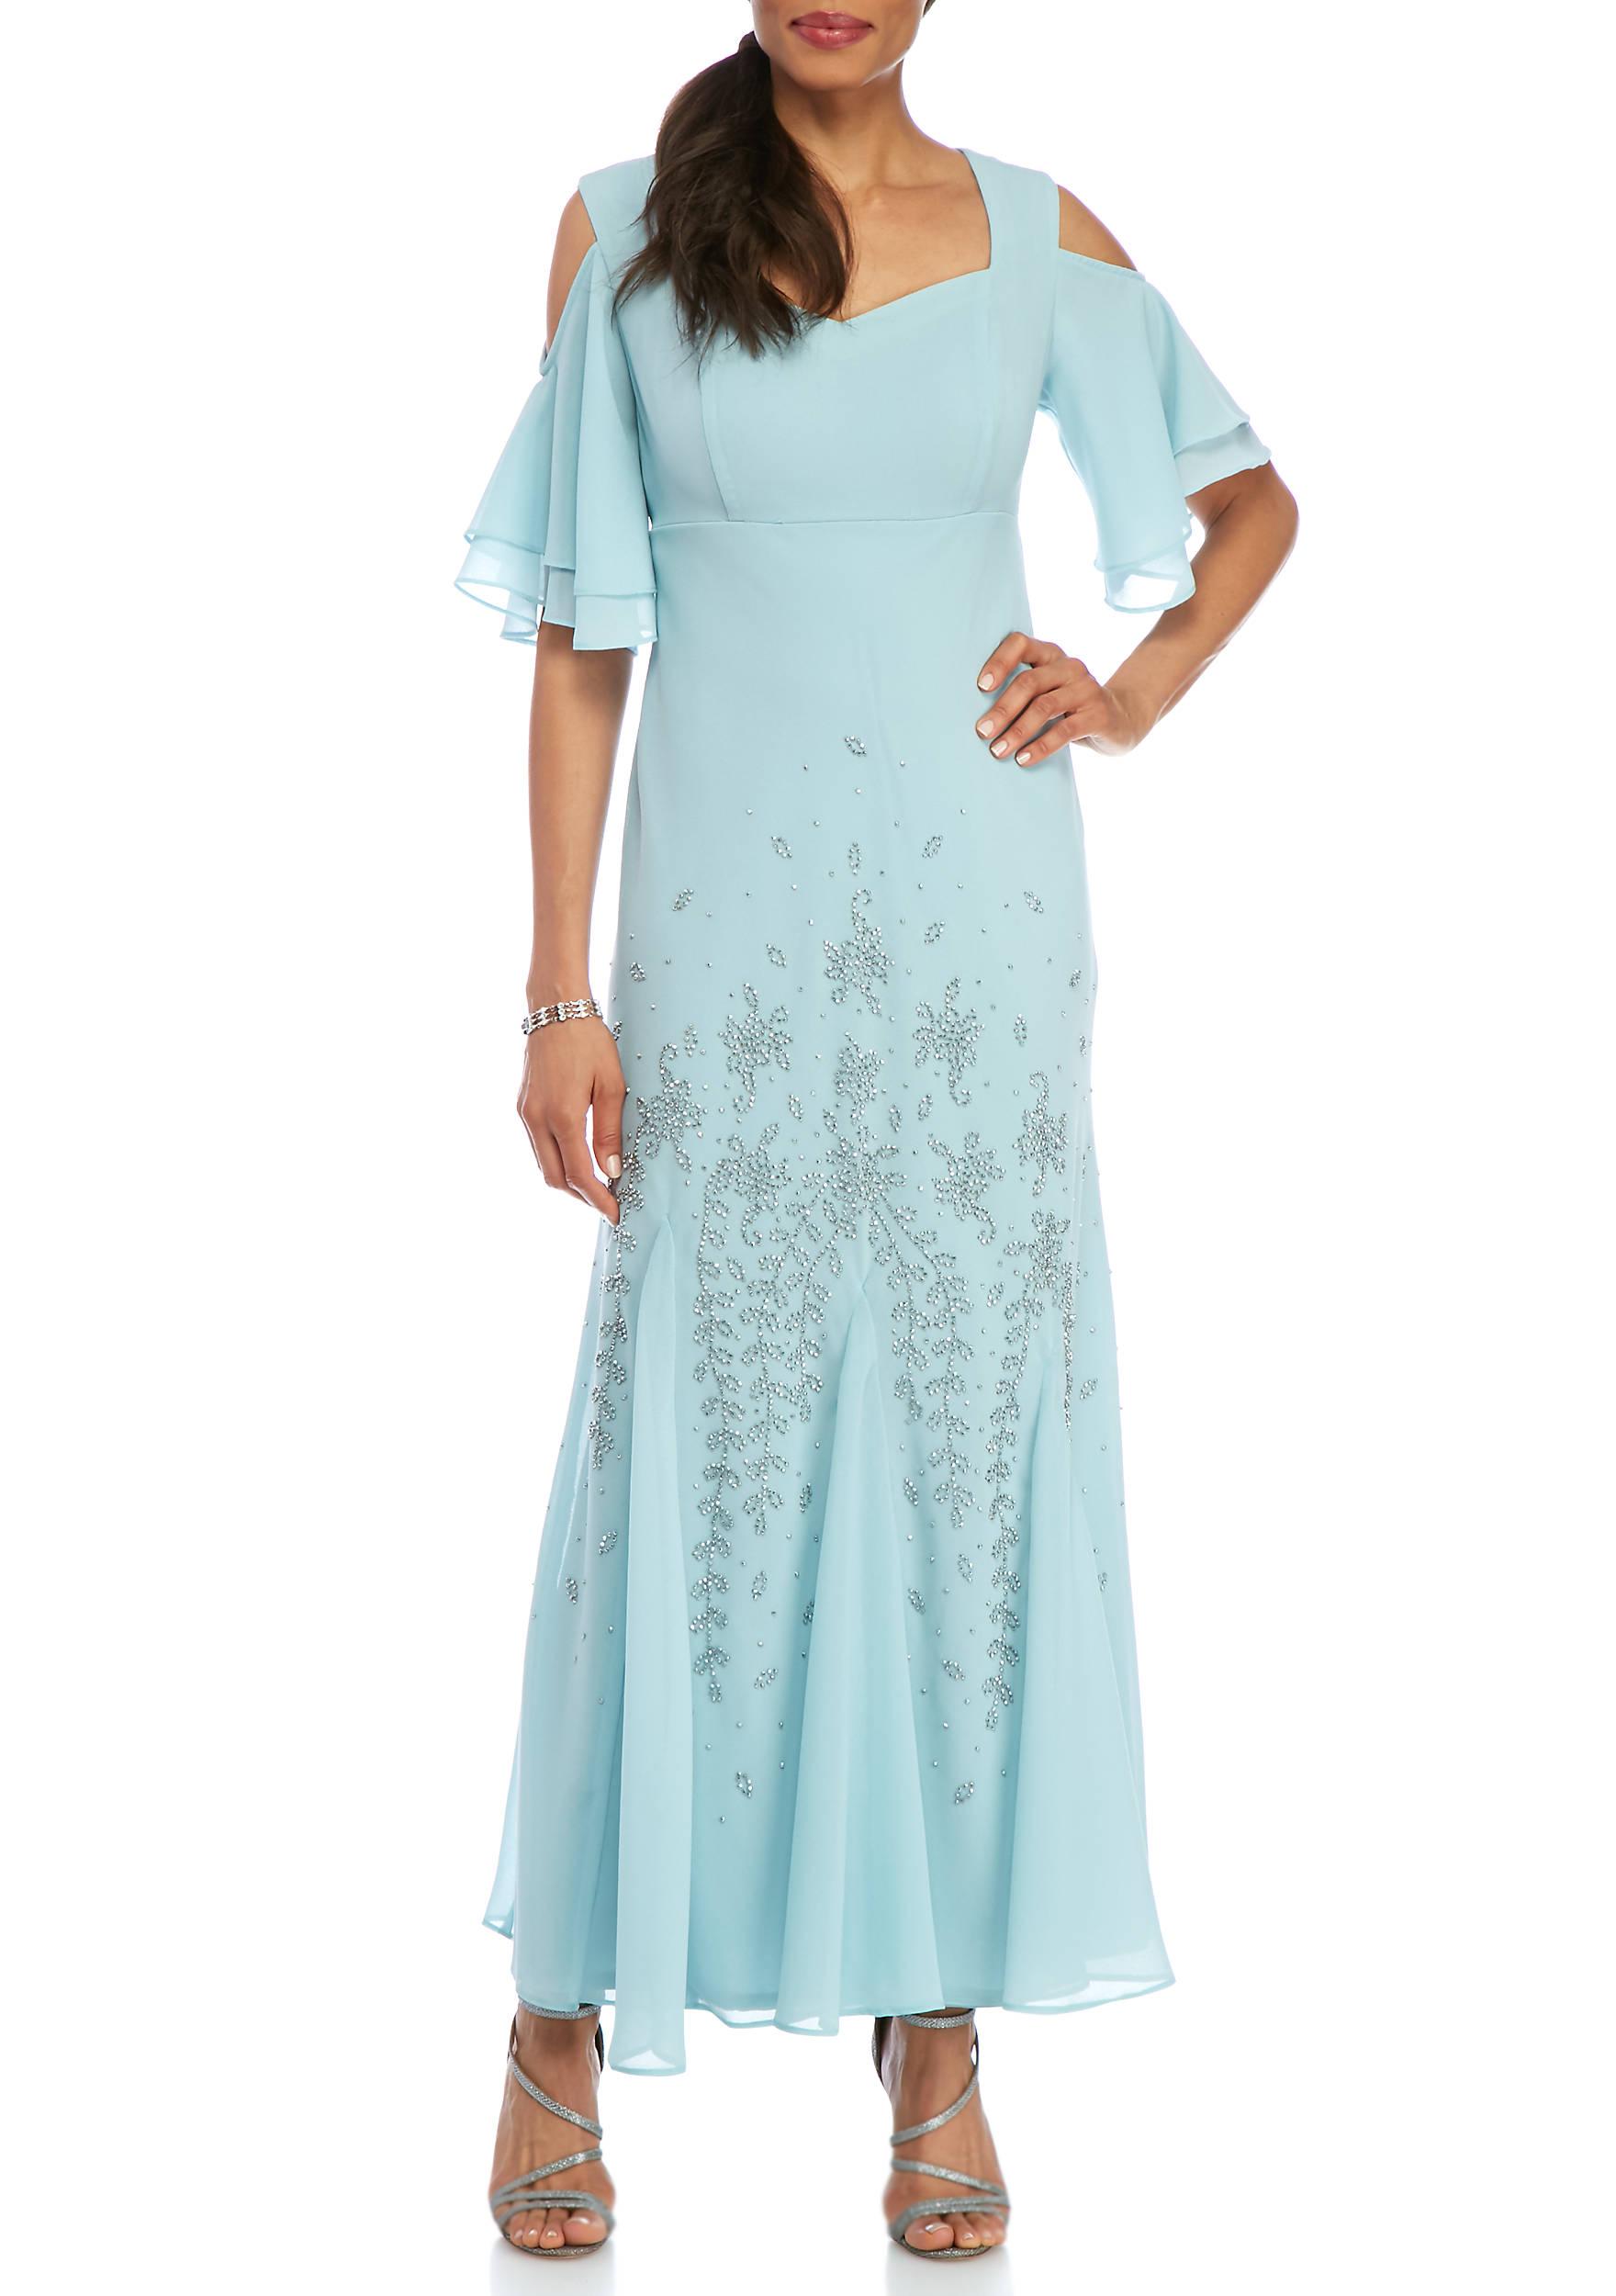 Contemporary Belk Wedding Dresses Inspiration - All Wedding Dresses ...